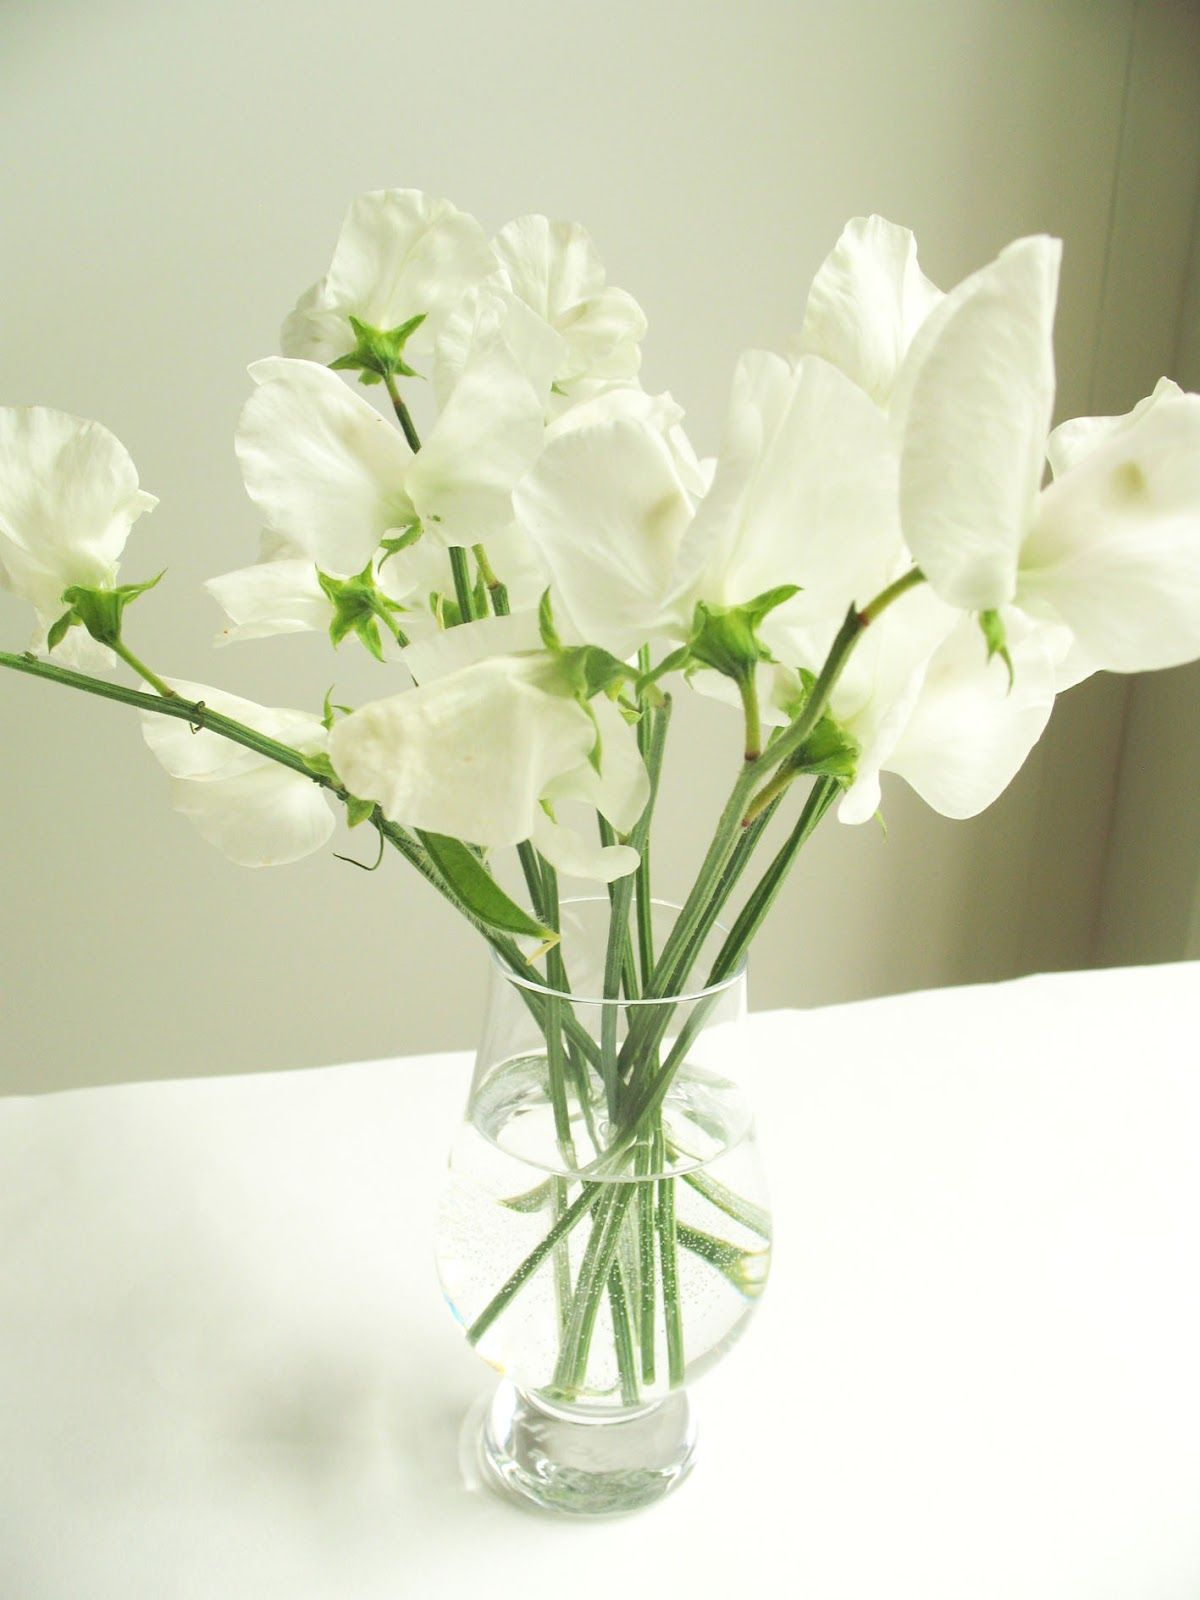 White sweet pea wedding flowers pinterest sweet pea flowers white sweet pea mightylinksfo Gallery